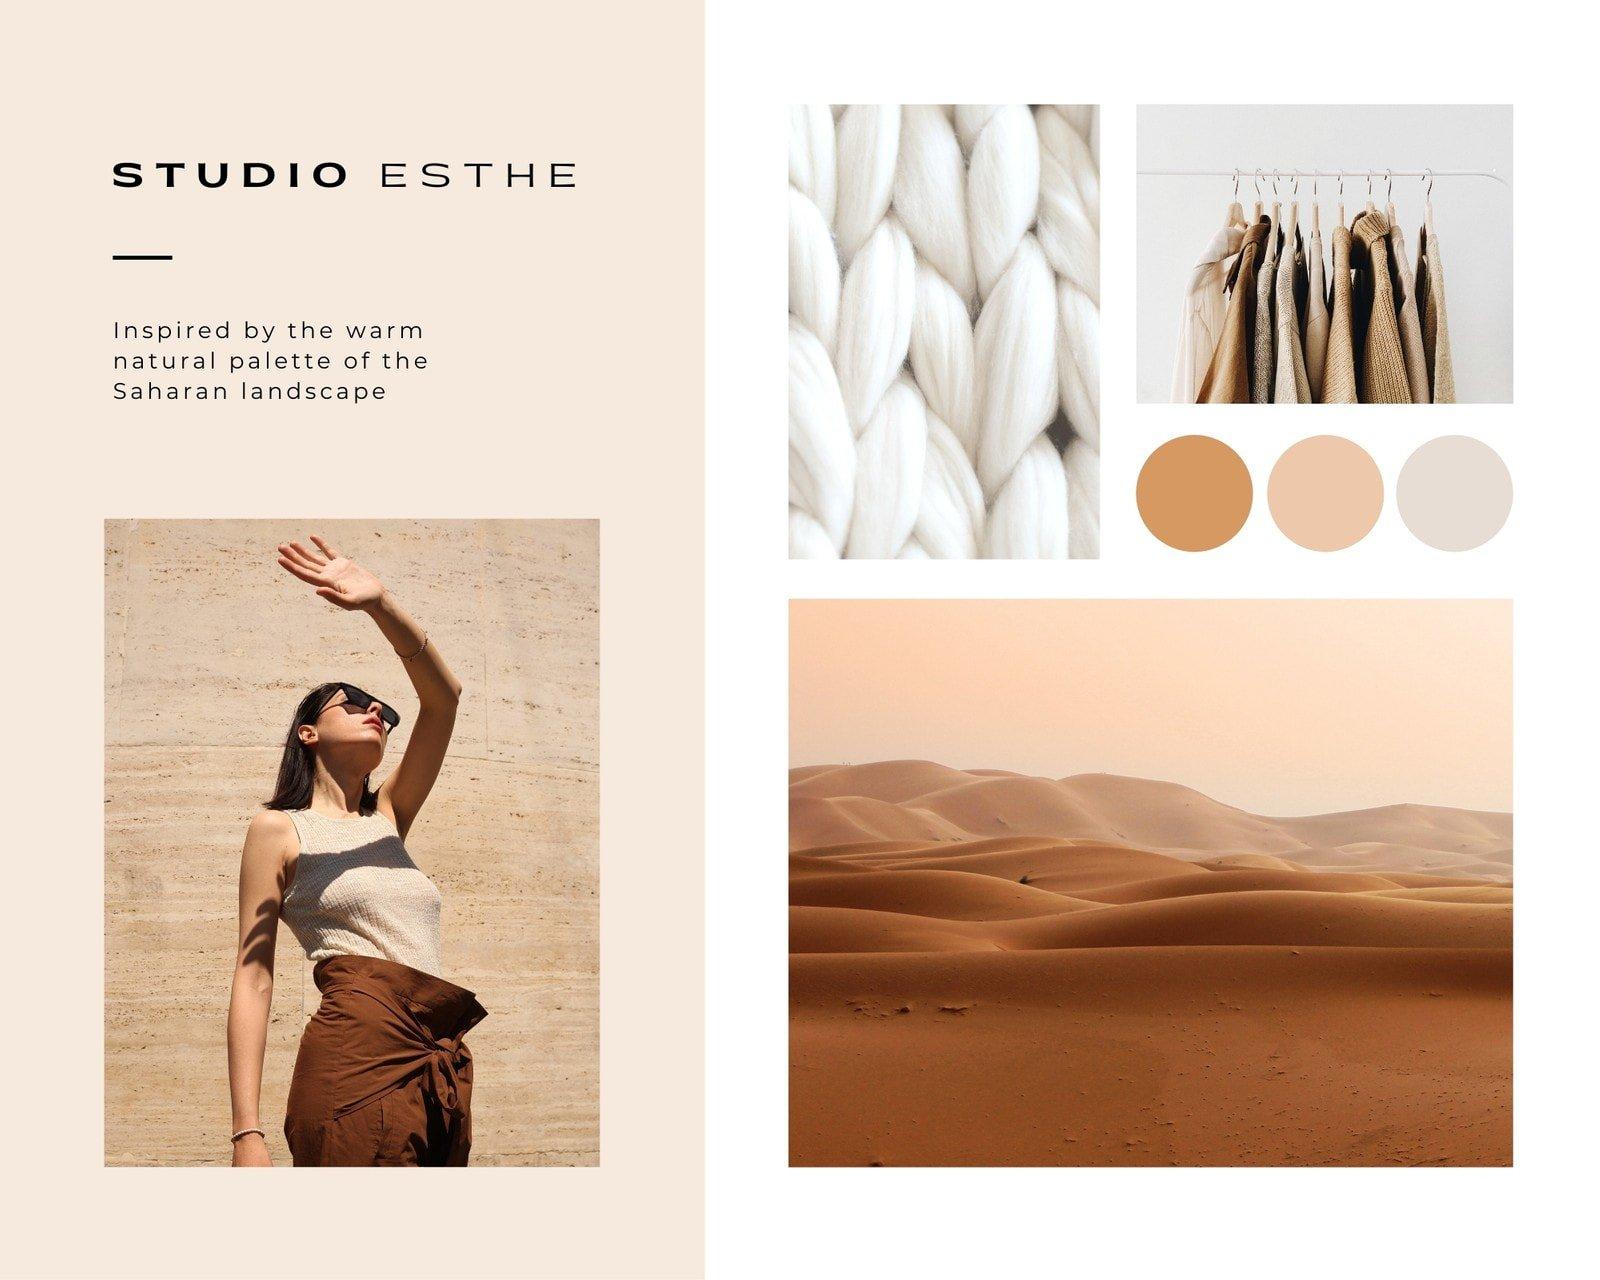 Brown and Peach Clean Grid Fashion Moodboard Photo Collage